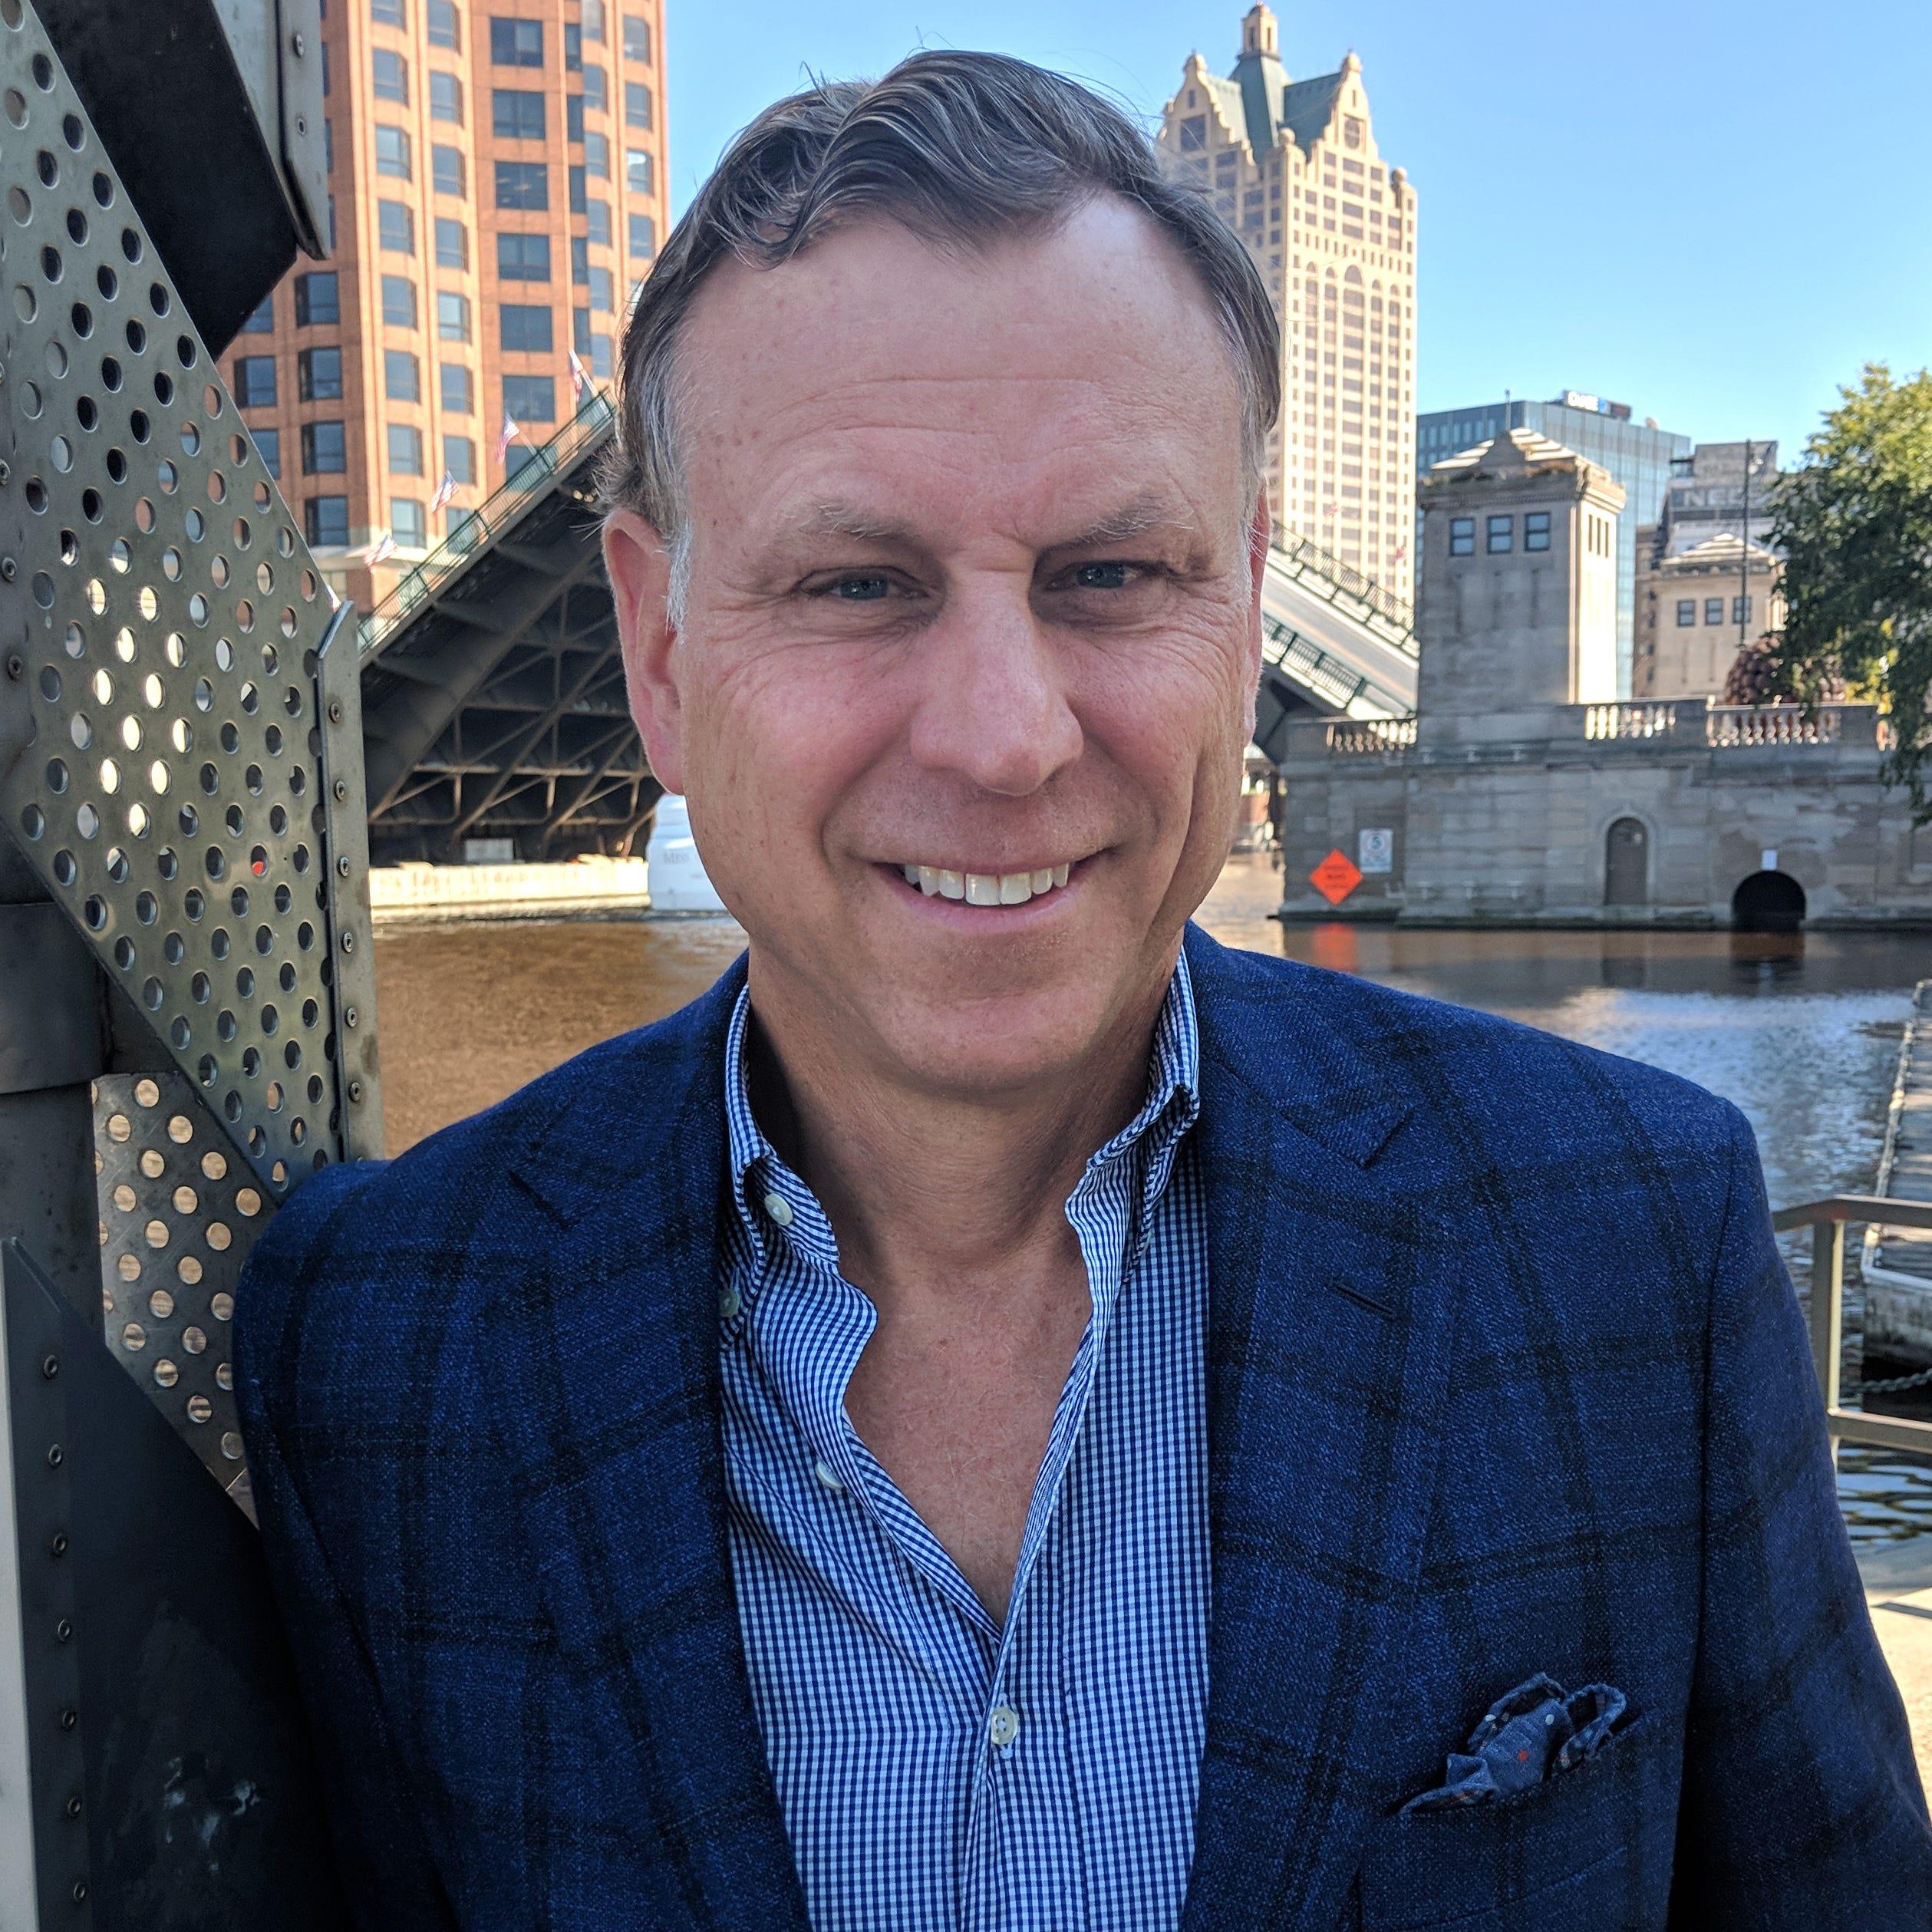 Jagler: Former Allen Edmonds CEO's new menswear brand celebrates American bravado